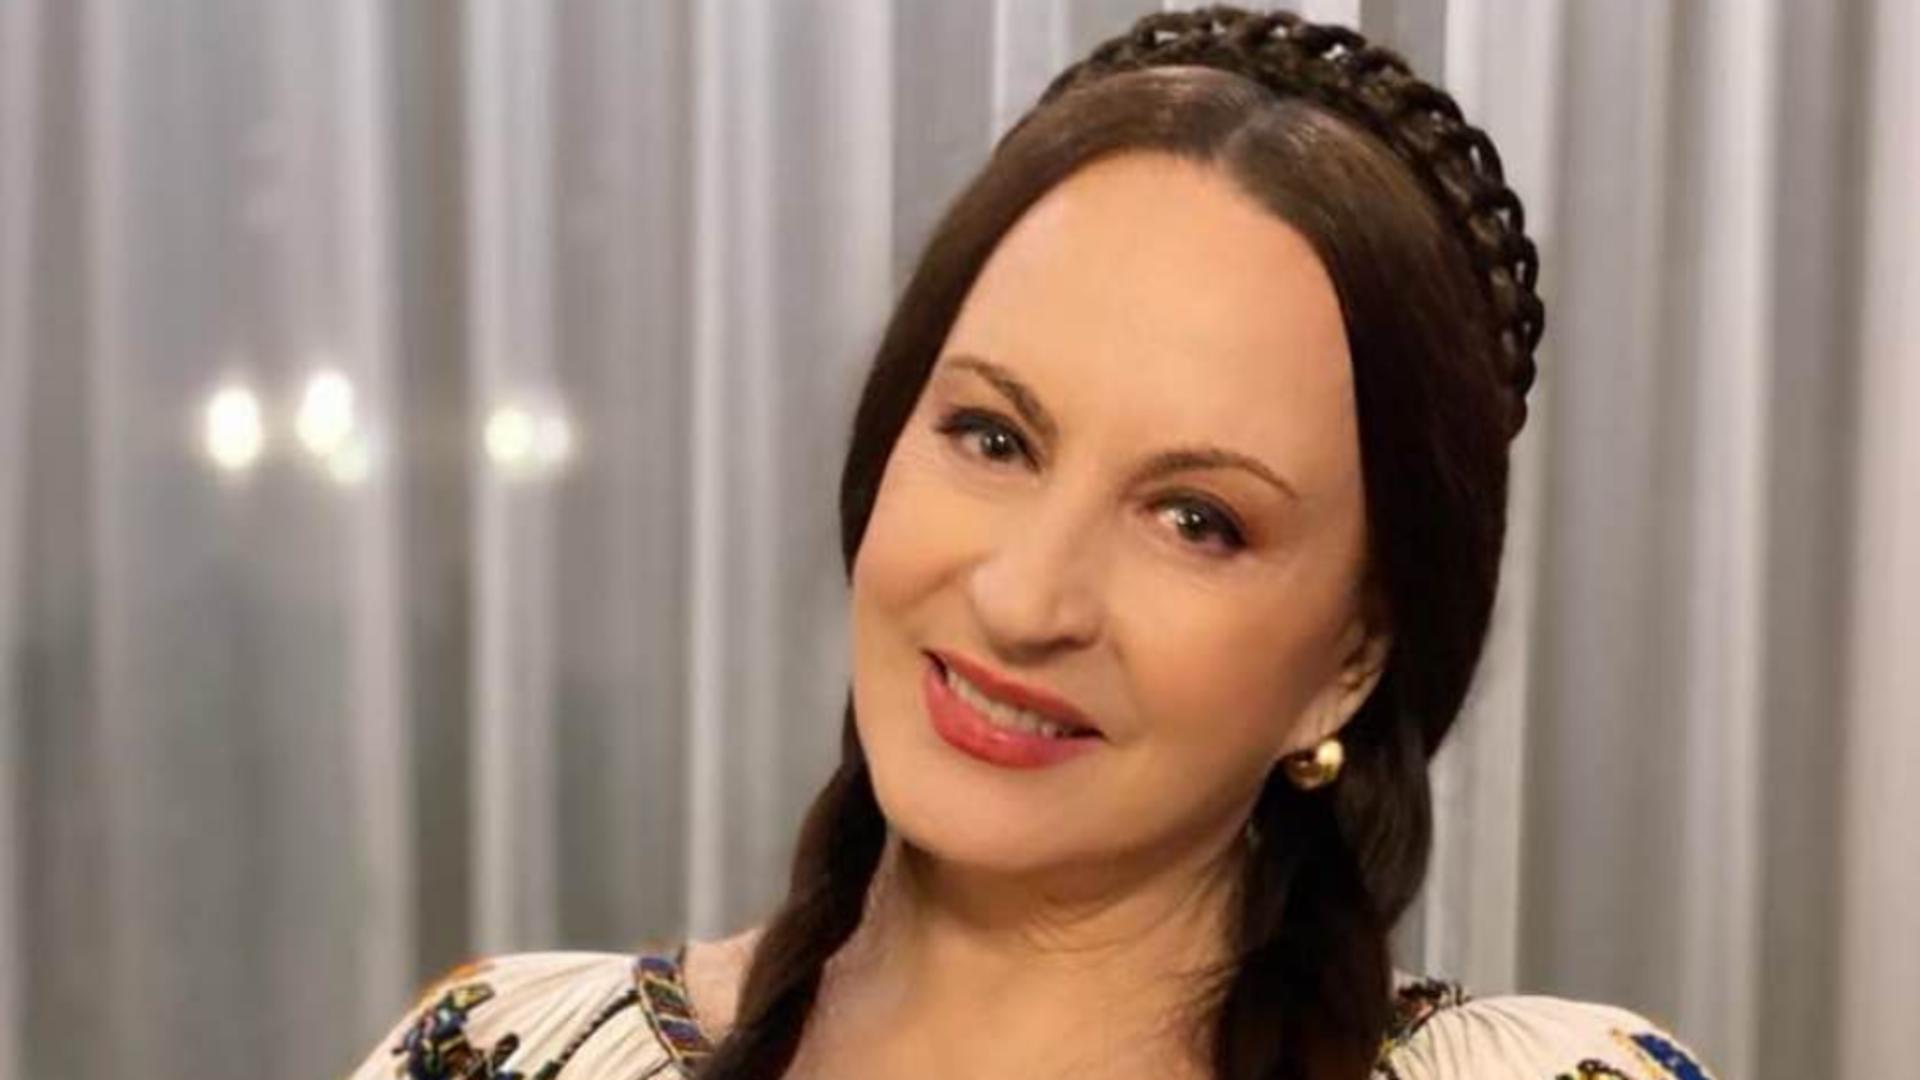 Maria Dragomiroiu se spala la lighean